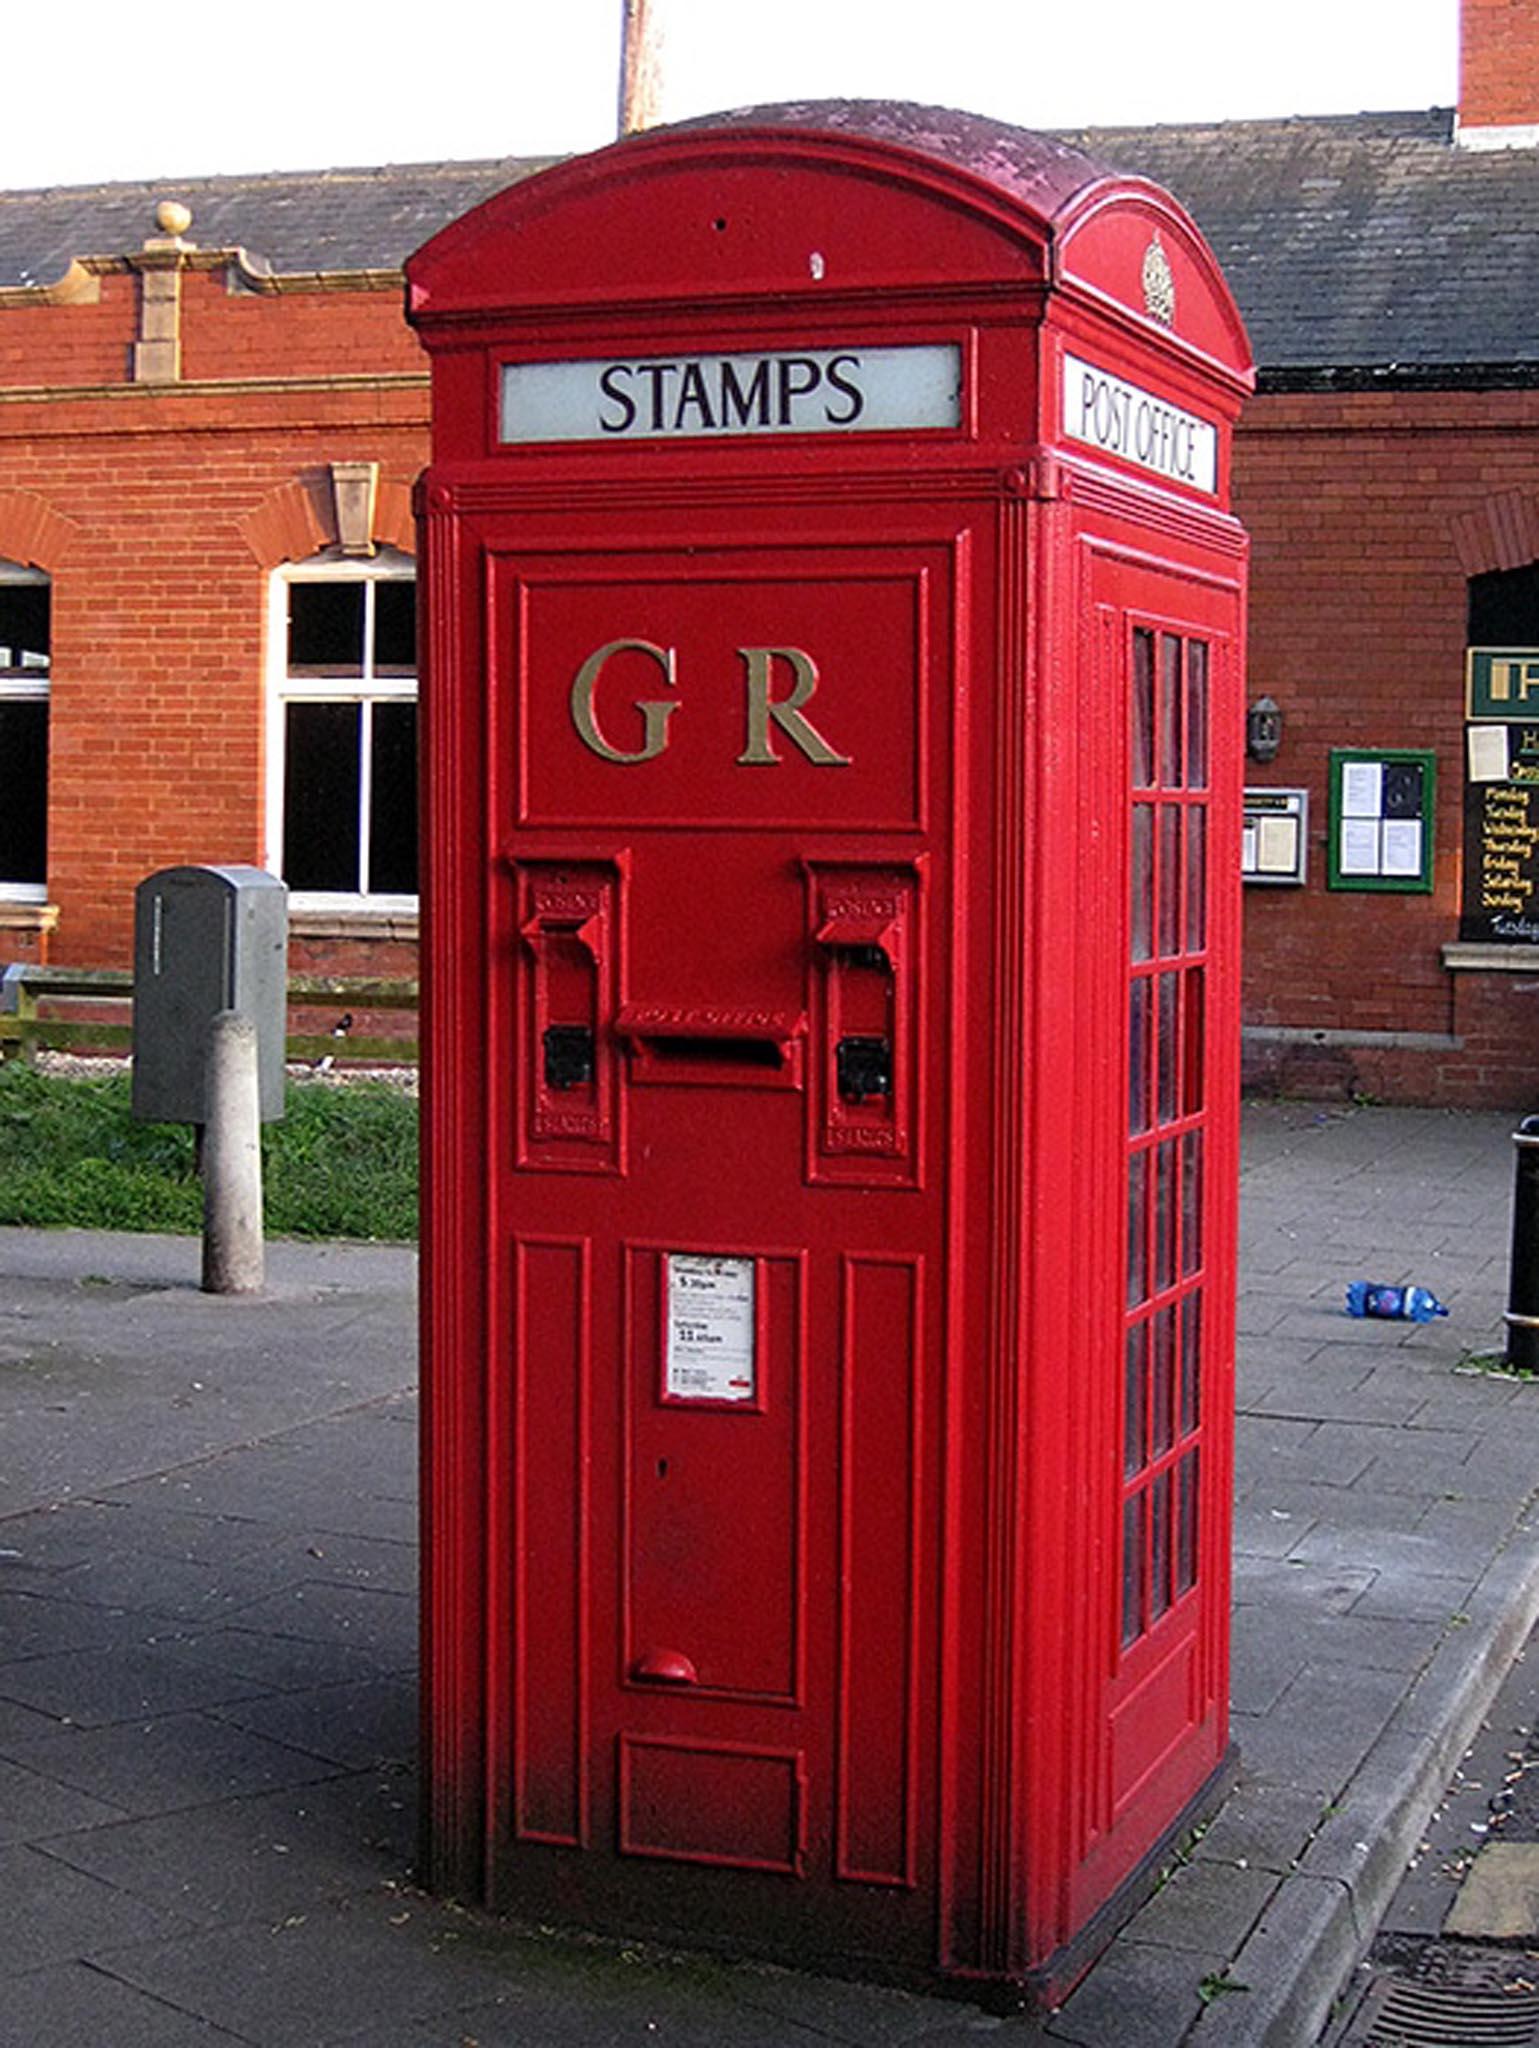 GR Vermillion Giant combined telephone kiosk and post box, 1920s, North East England. Howard Wilson